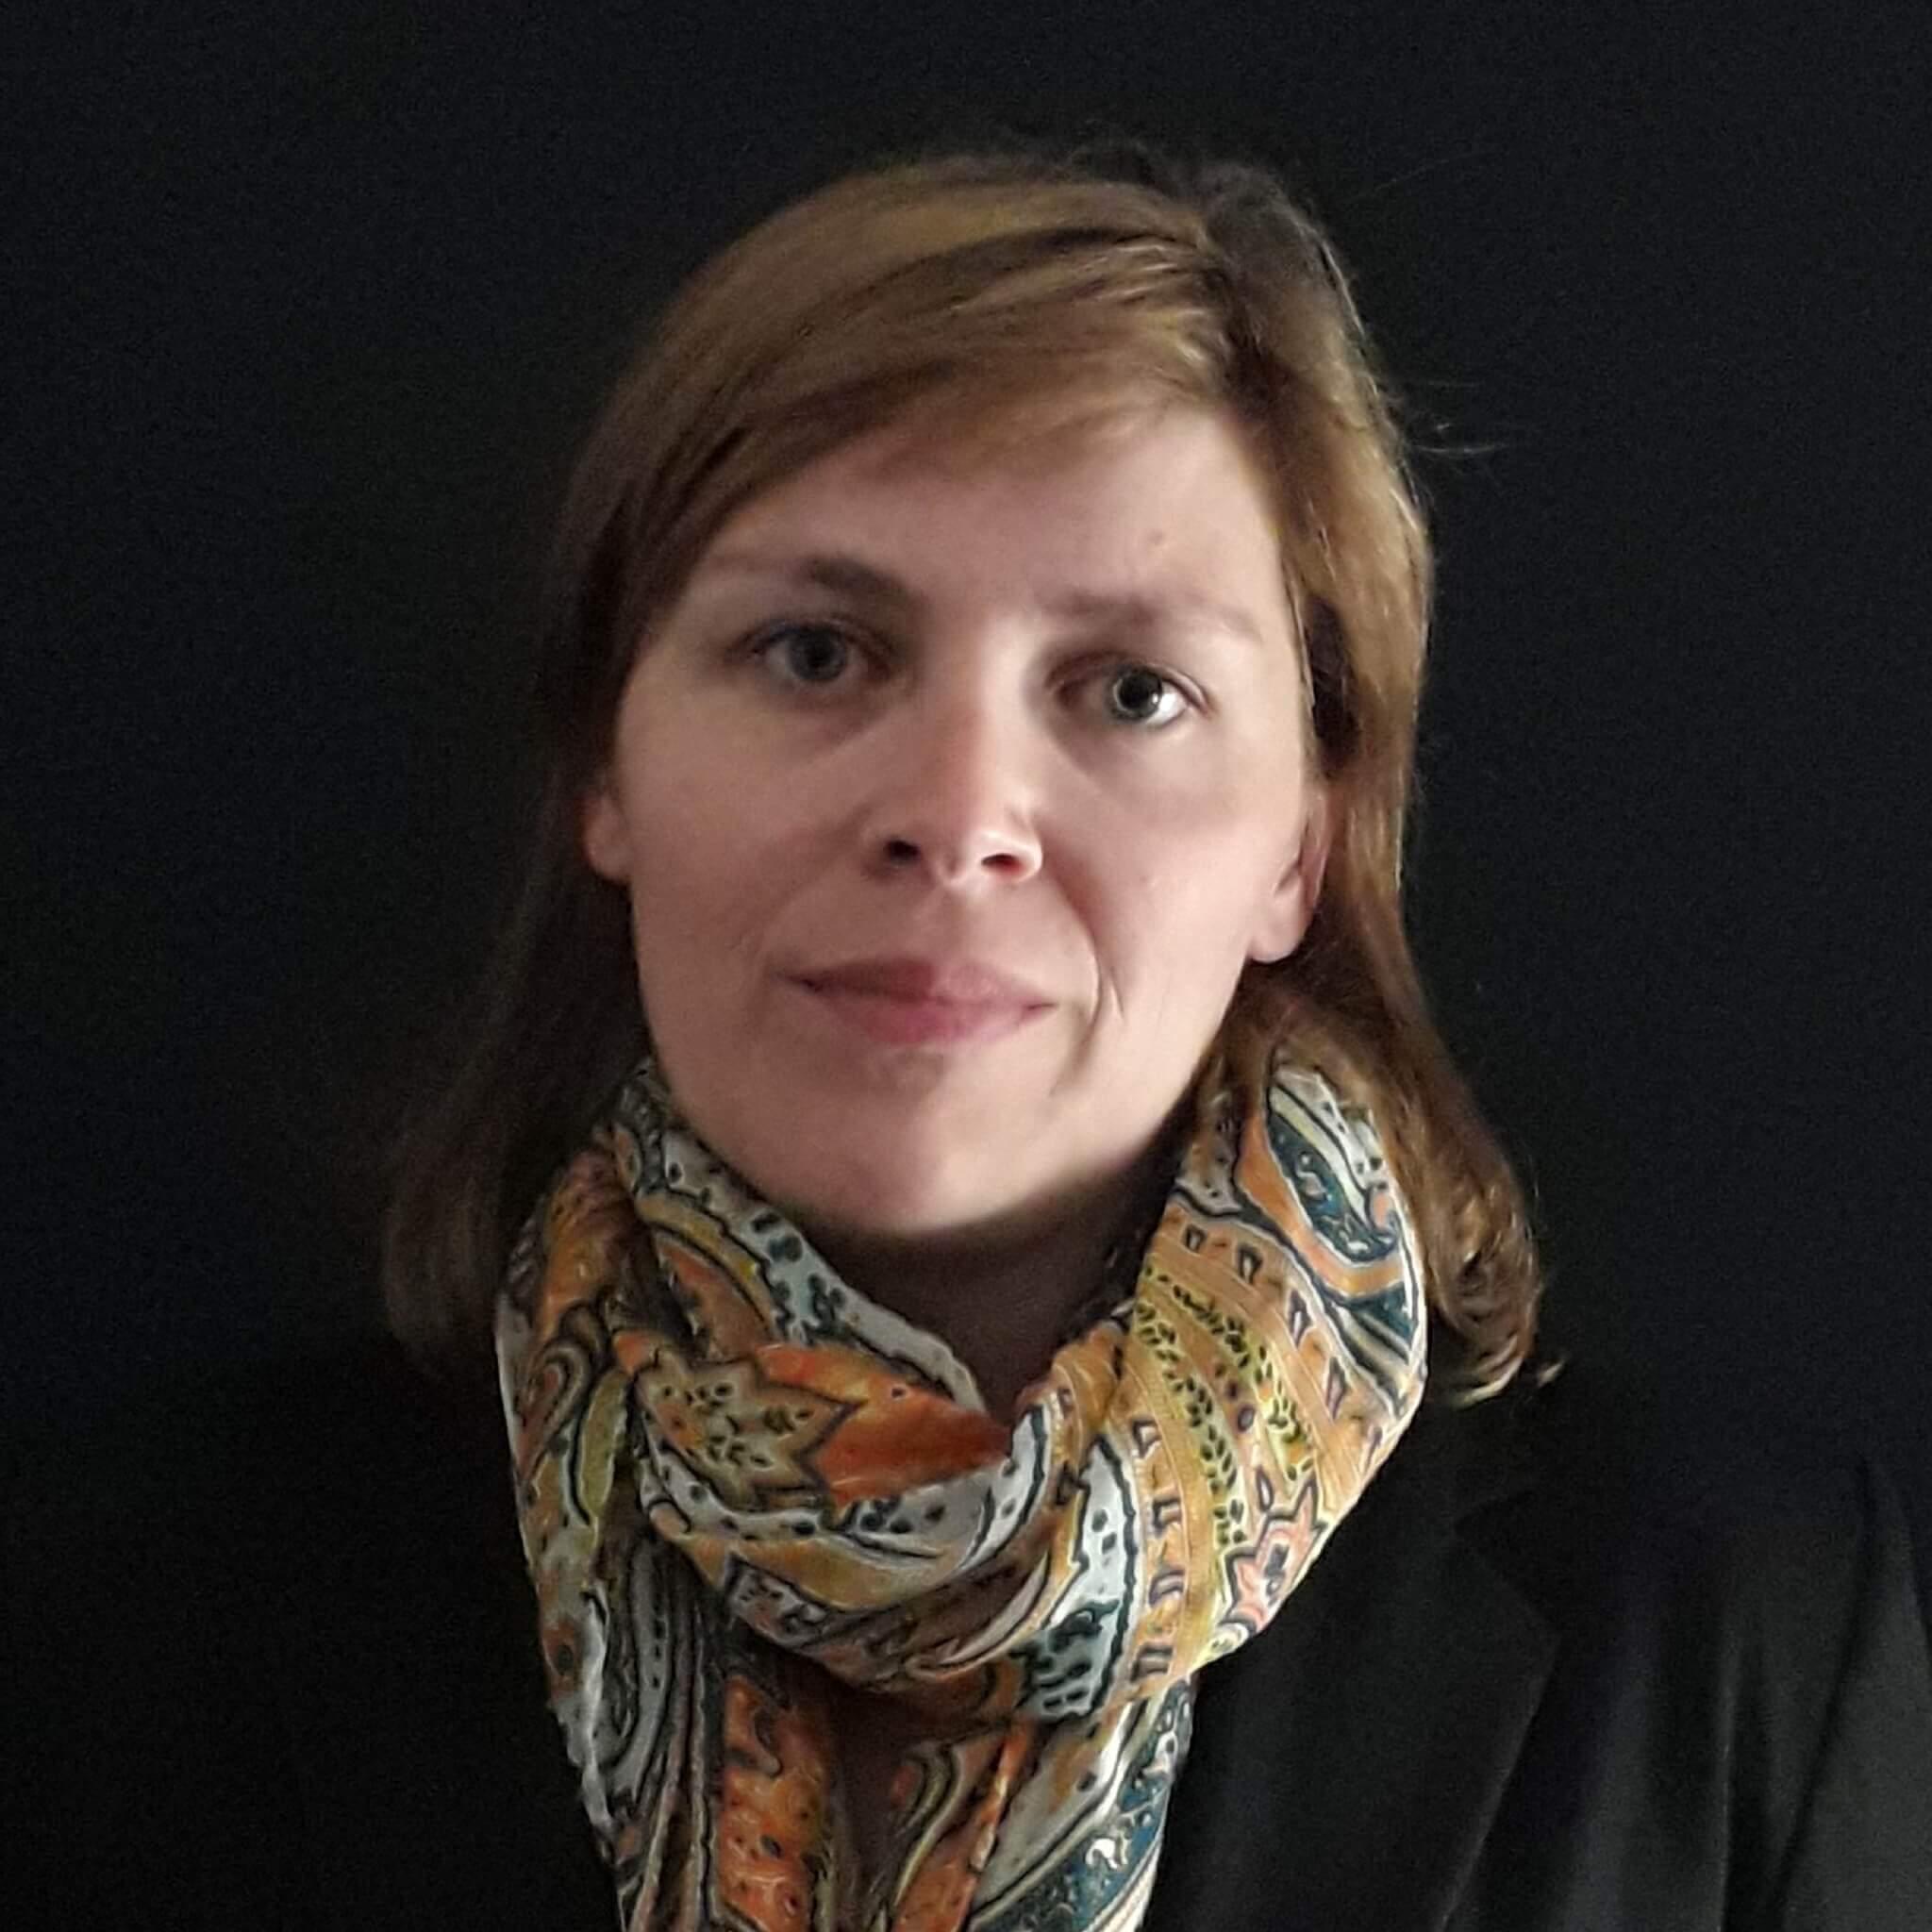 Martina Filipa Afonso Moreiras Diegues